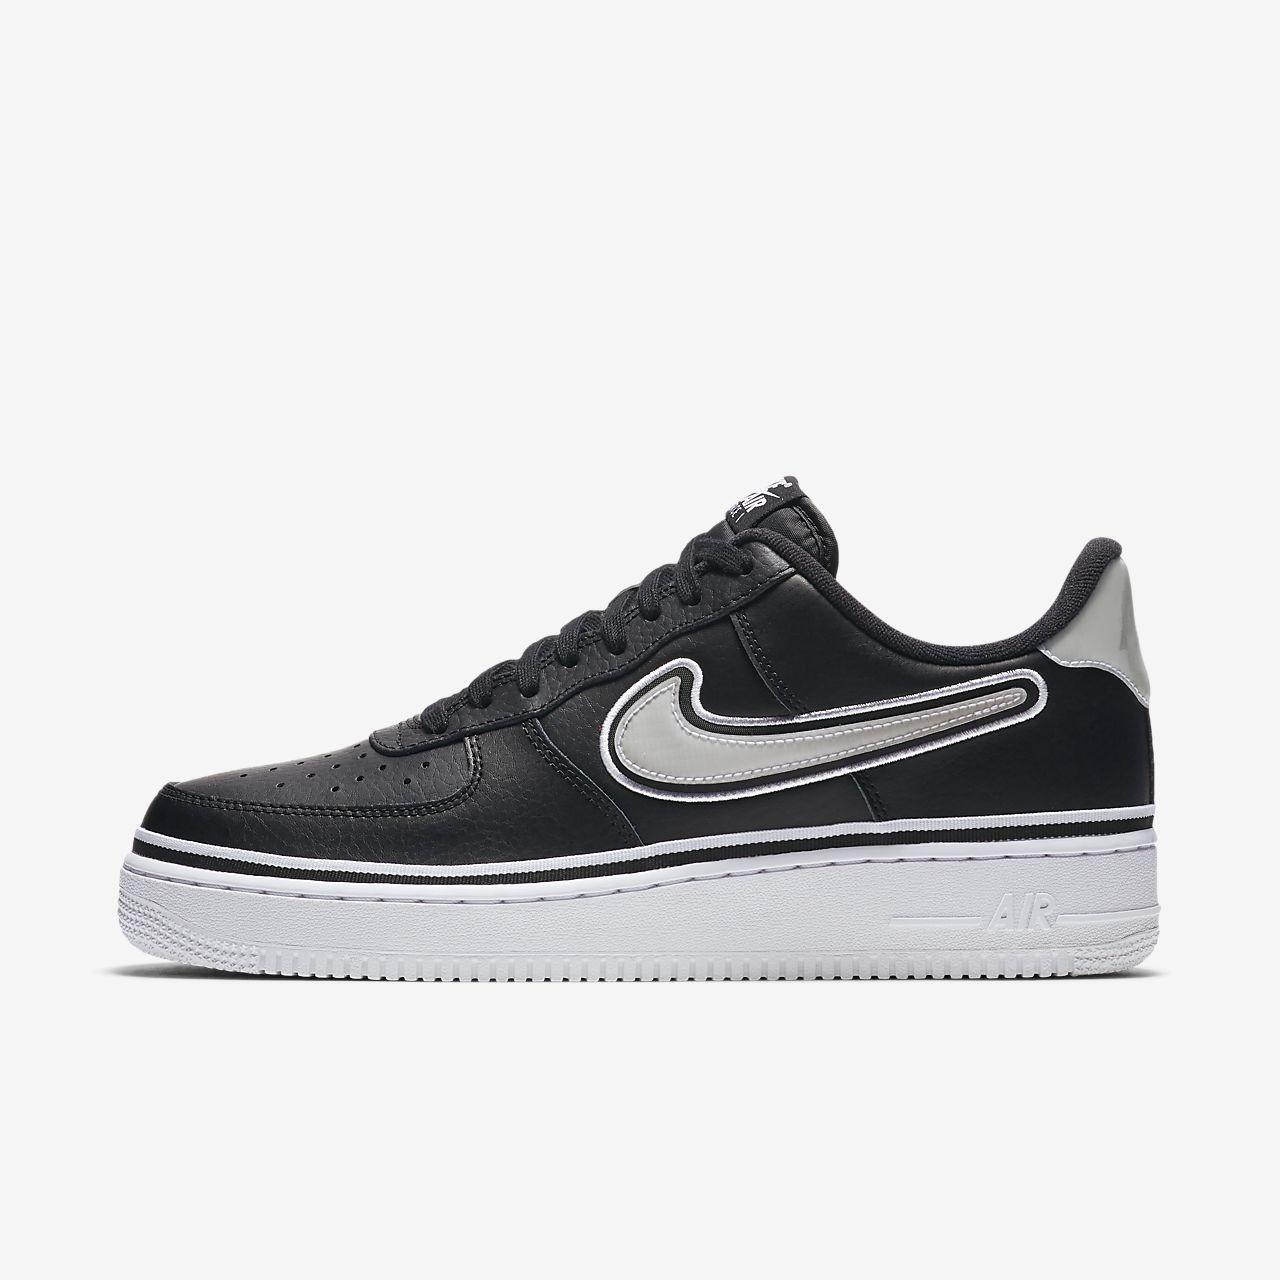 Whit Air Force 1 Nike Low Nba Damskie rdQshtCx